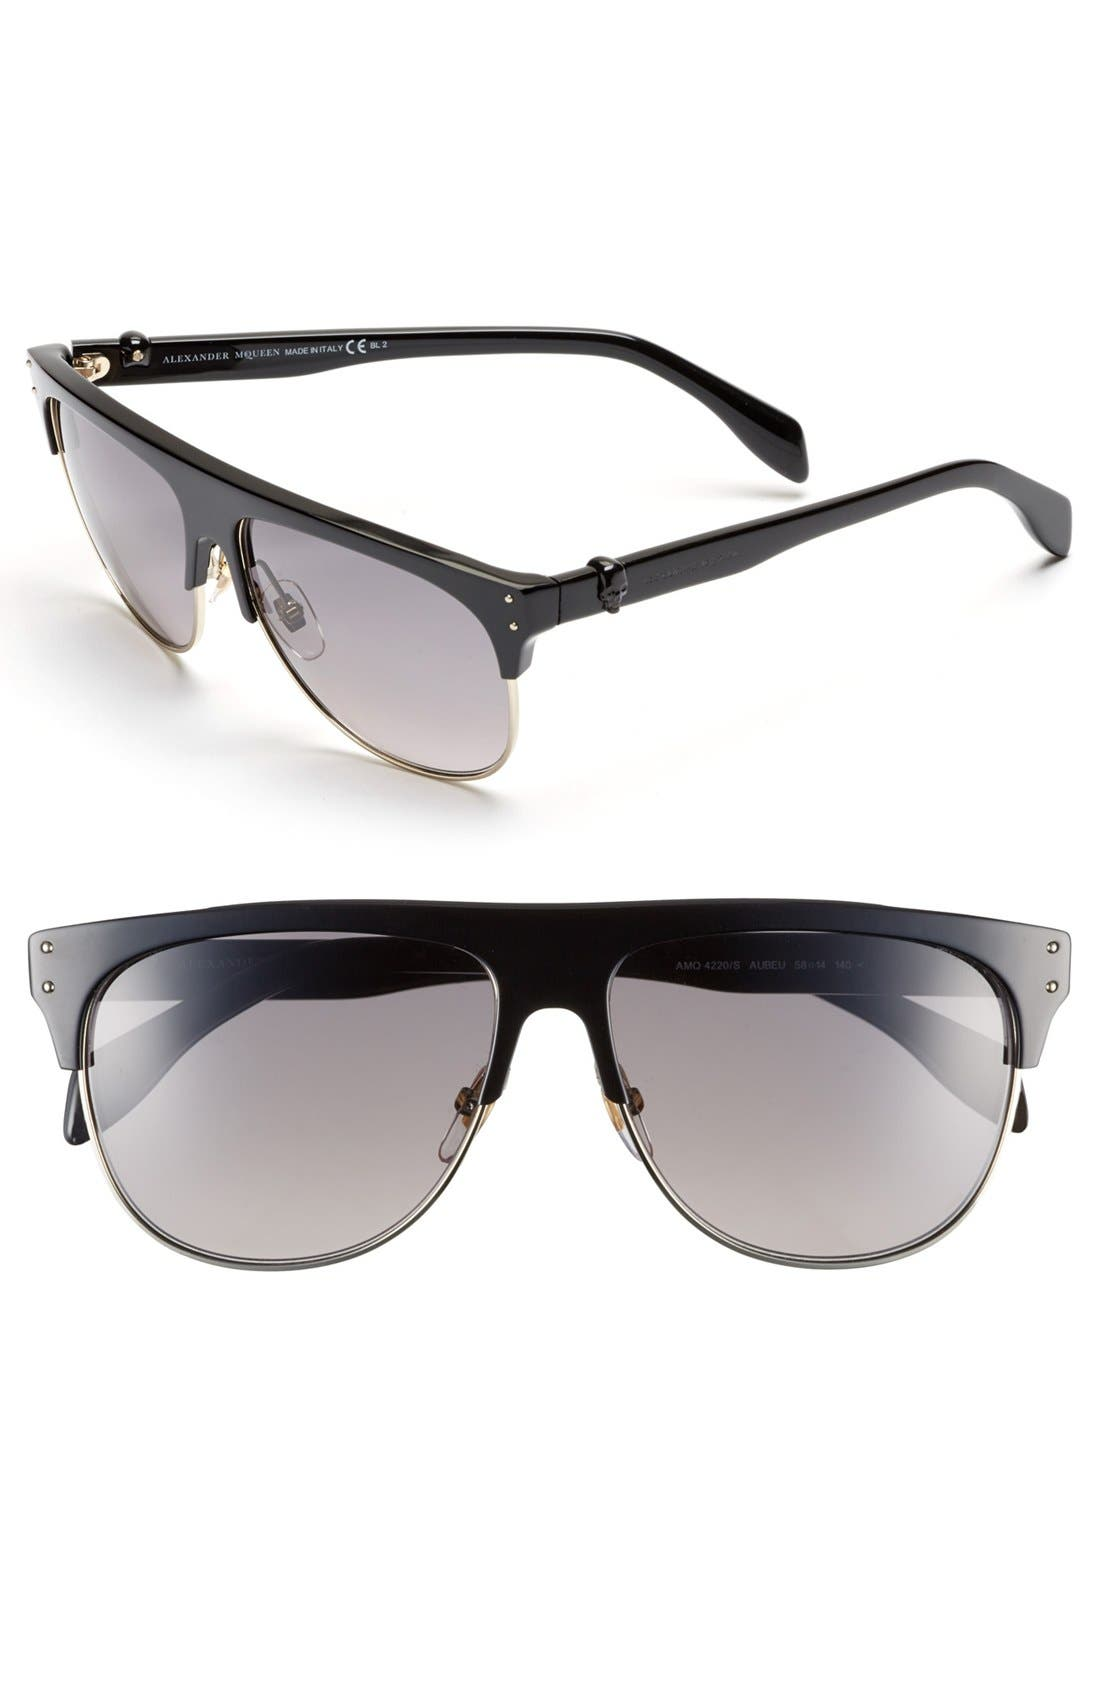 Alternate Image 1 Selected - Alexander McQueen 58mm Retro Sunglasses